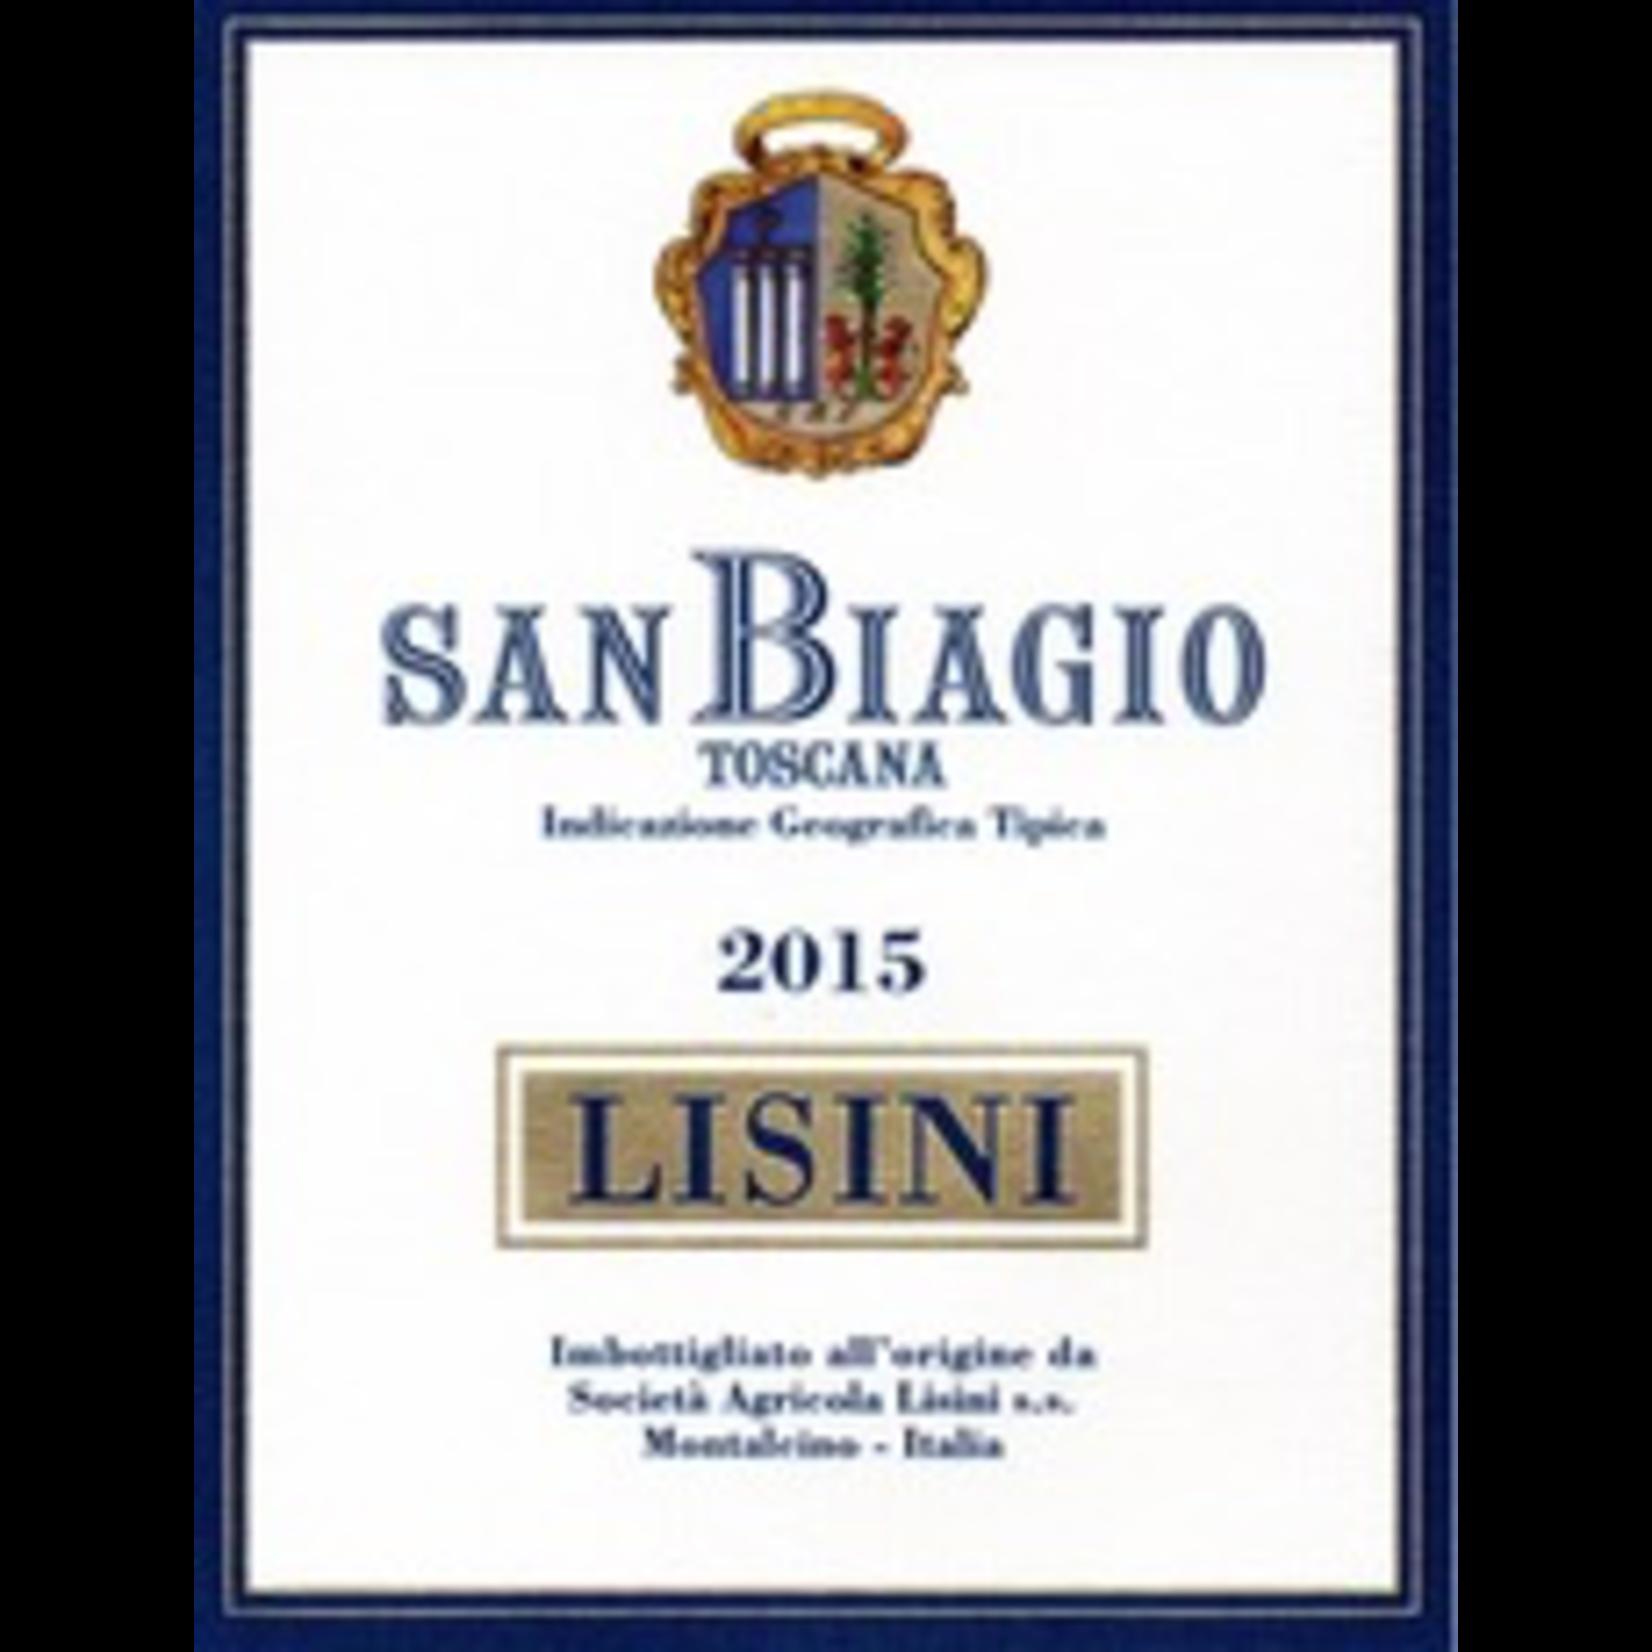 Wine Lisini Tocsana San Biagio 2017